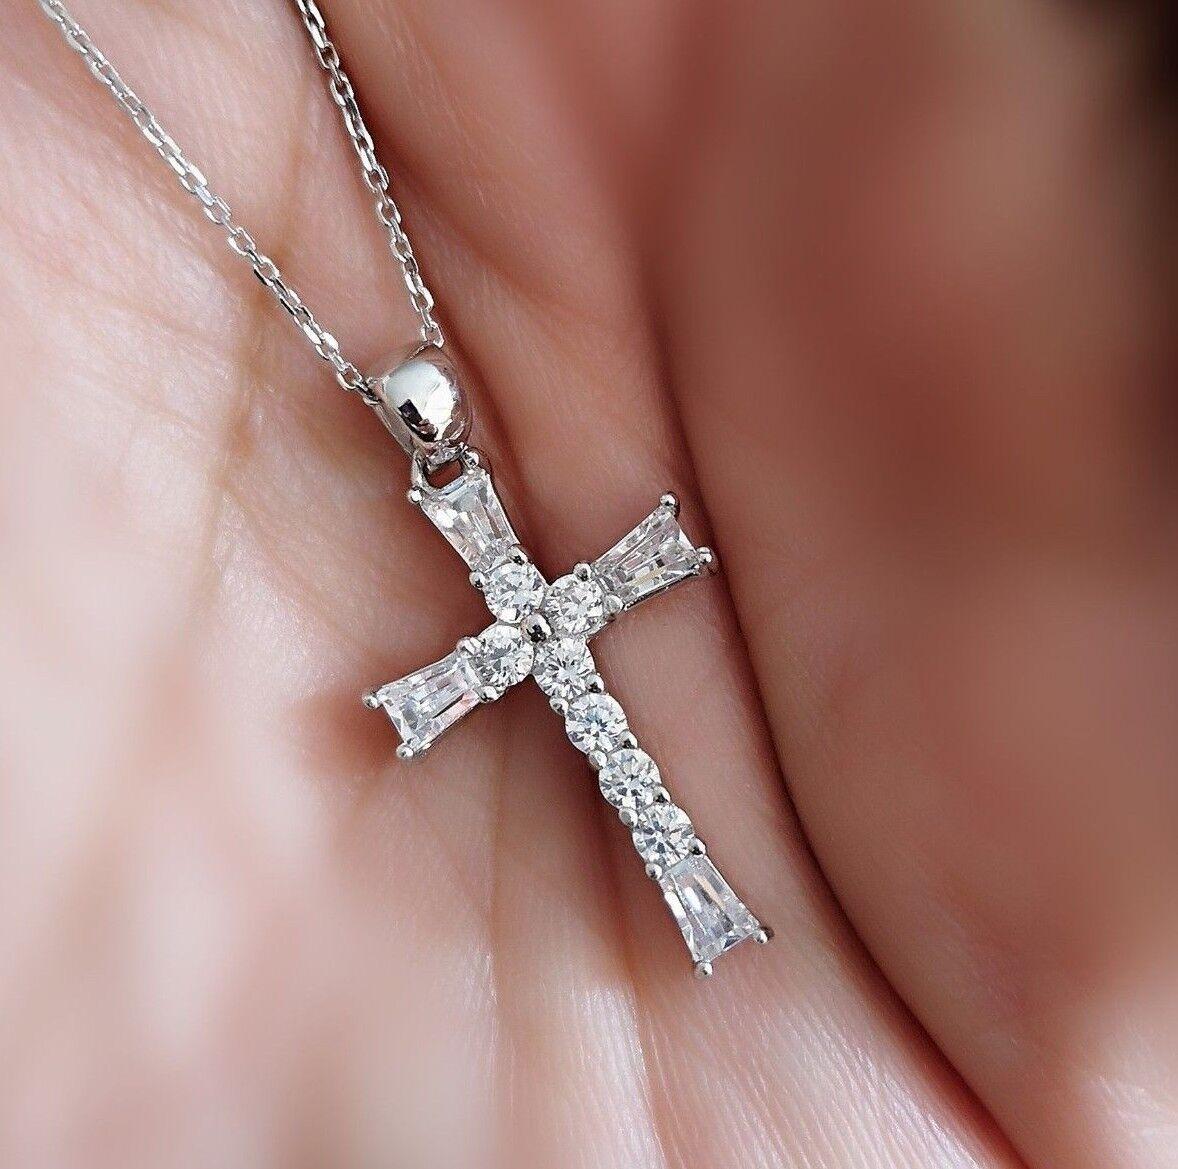 1Ct Diamond Cross Pendant Necklace with Chain 14K White Gold over Women's Men's